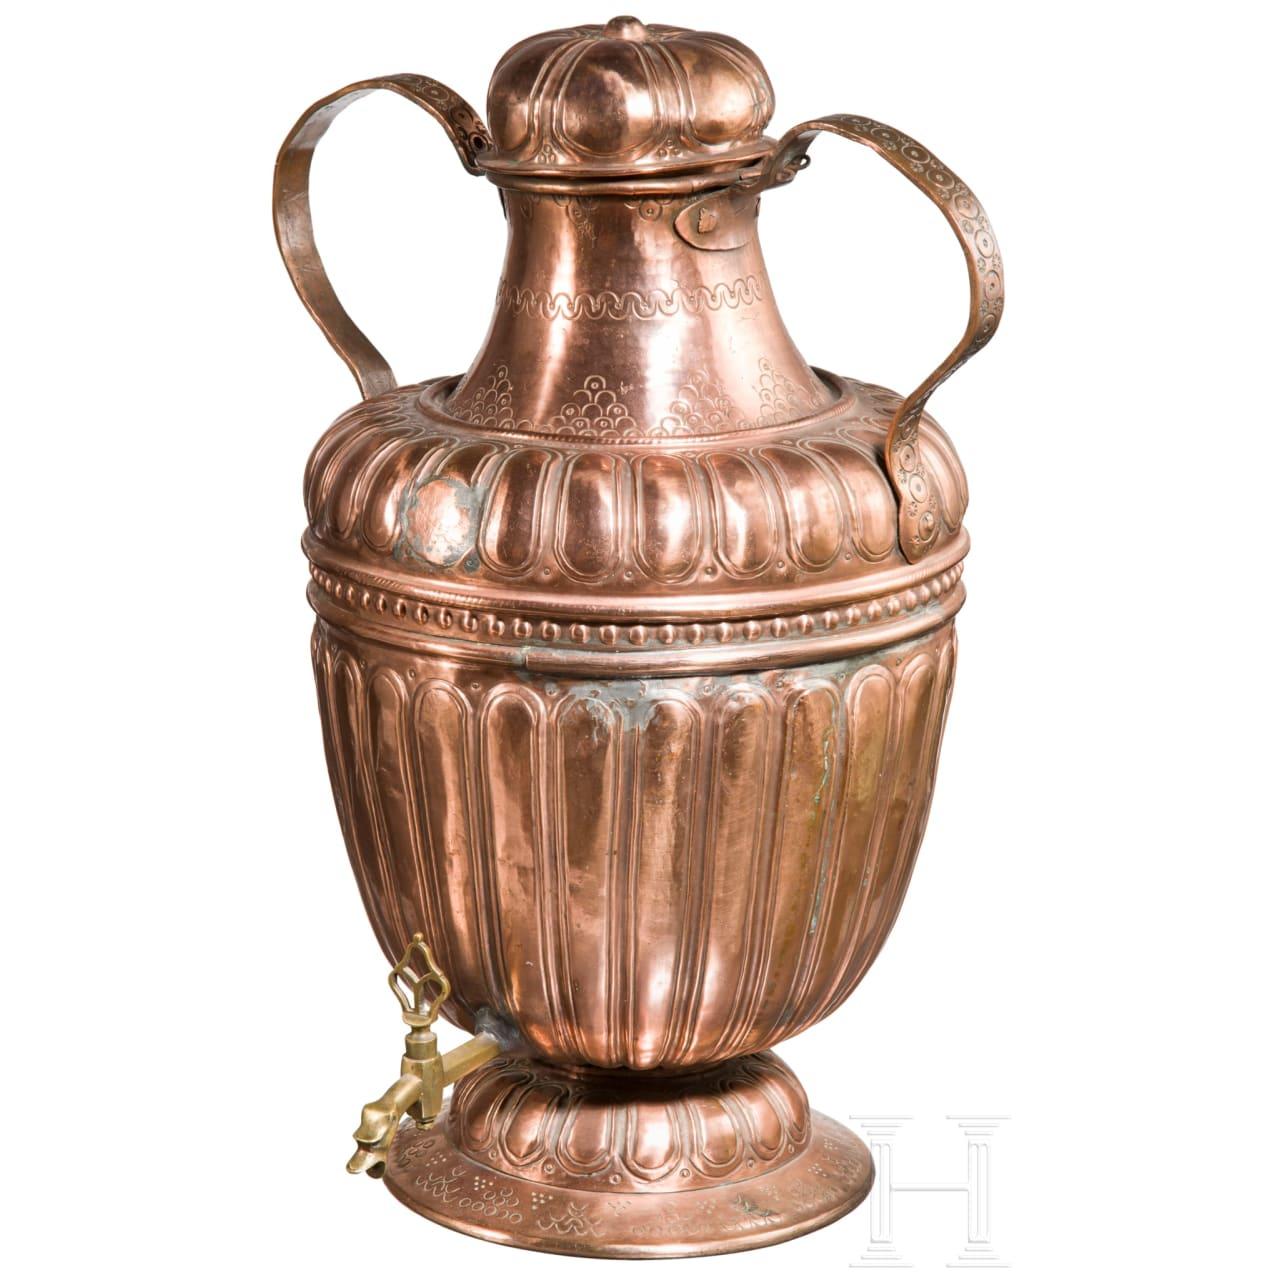 A large Venetian copper water jug, 17th century